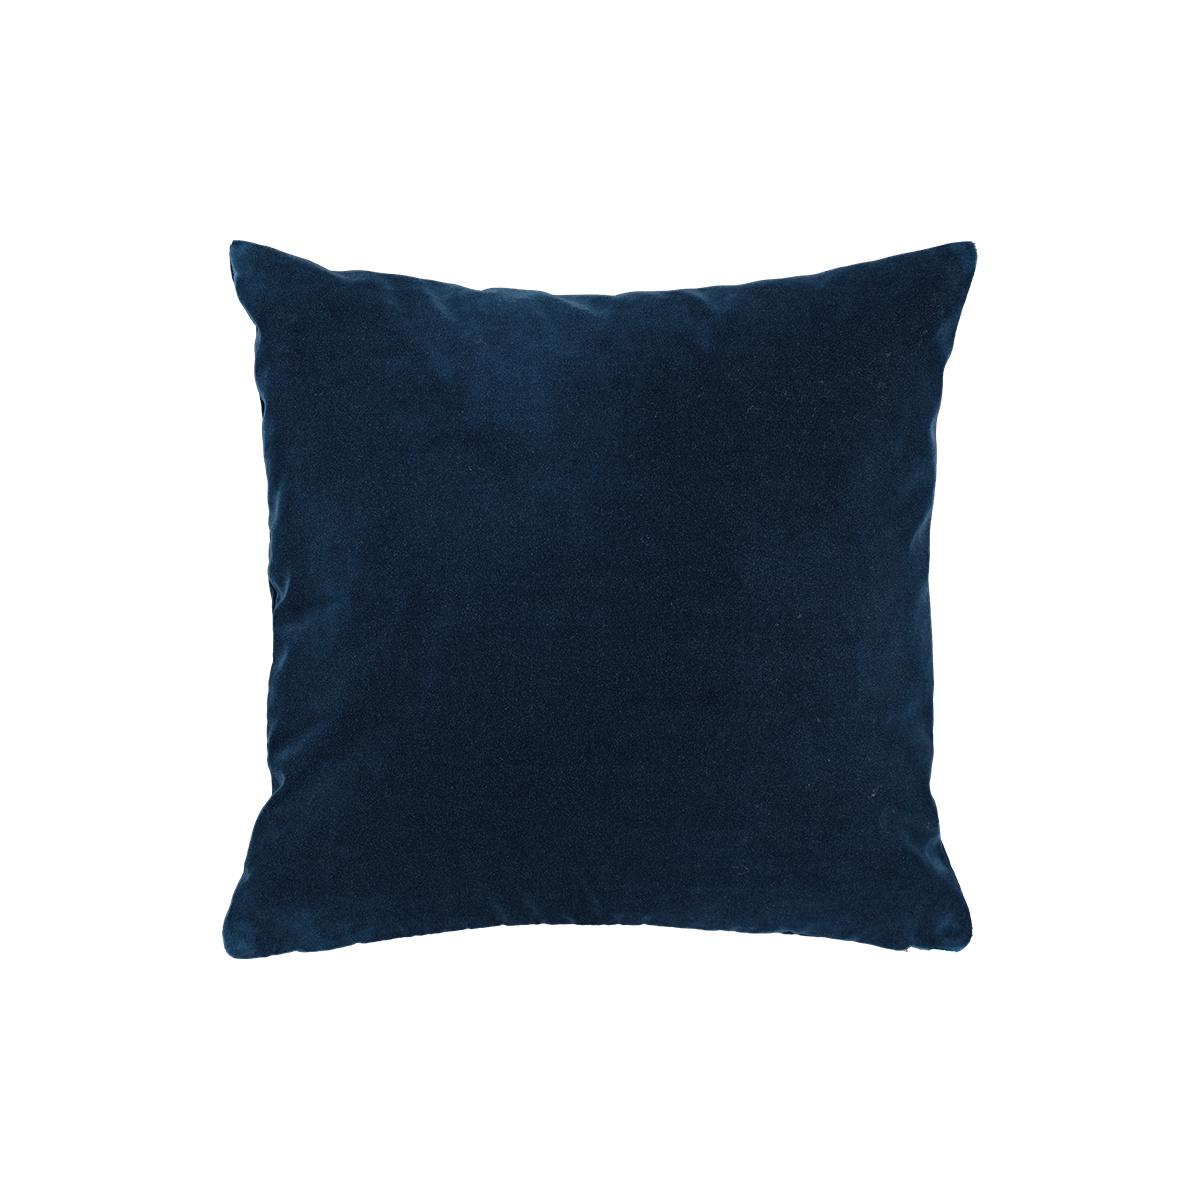 Rotondo Night Blue Velvet Cushion